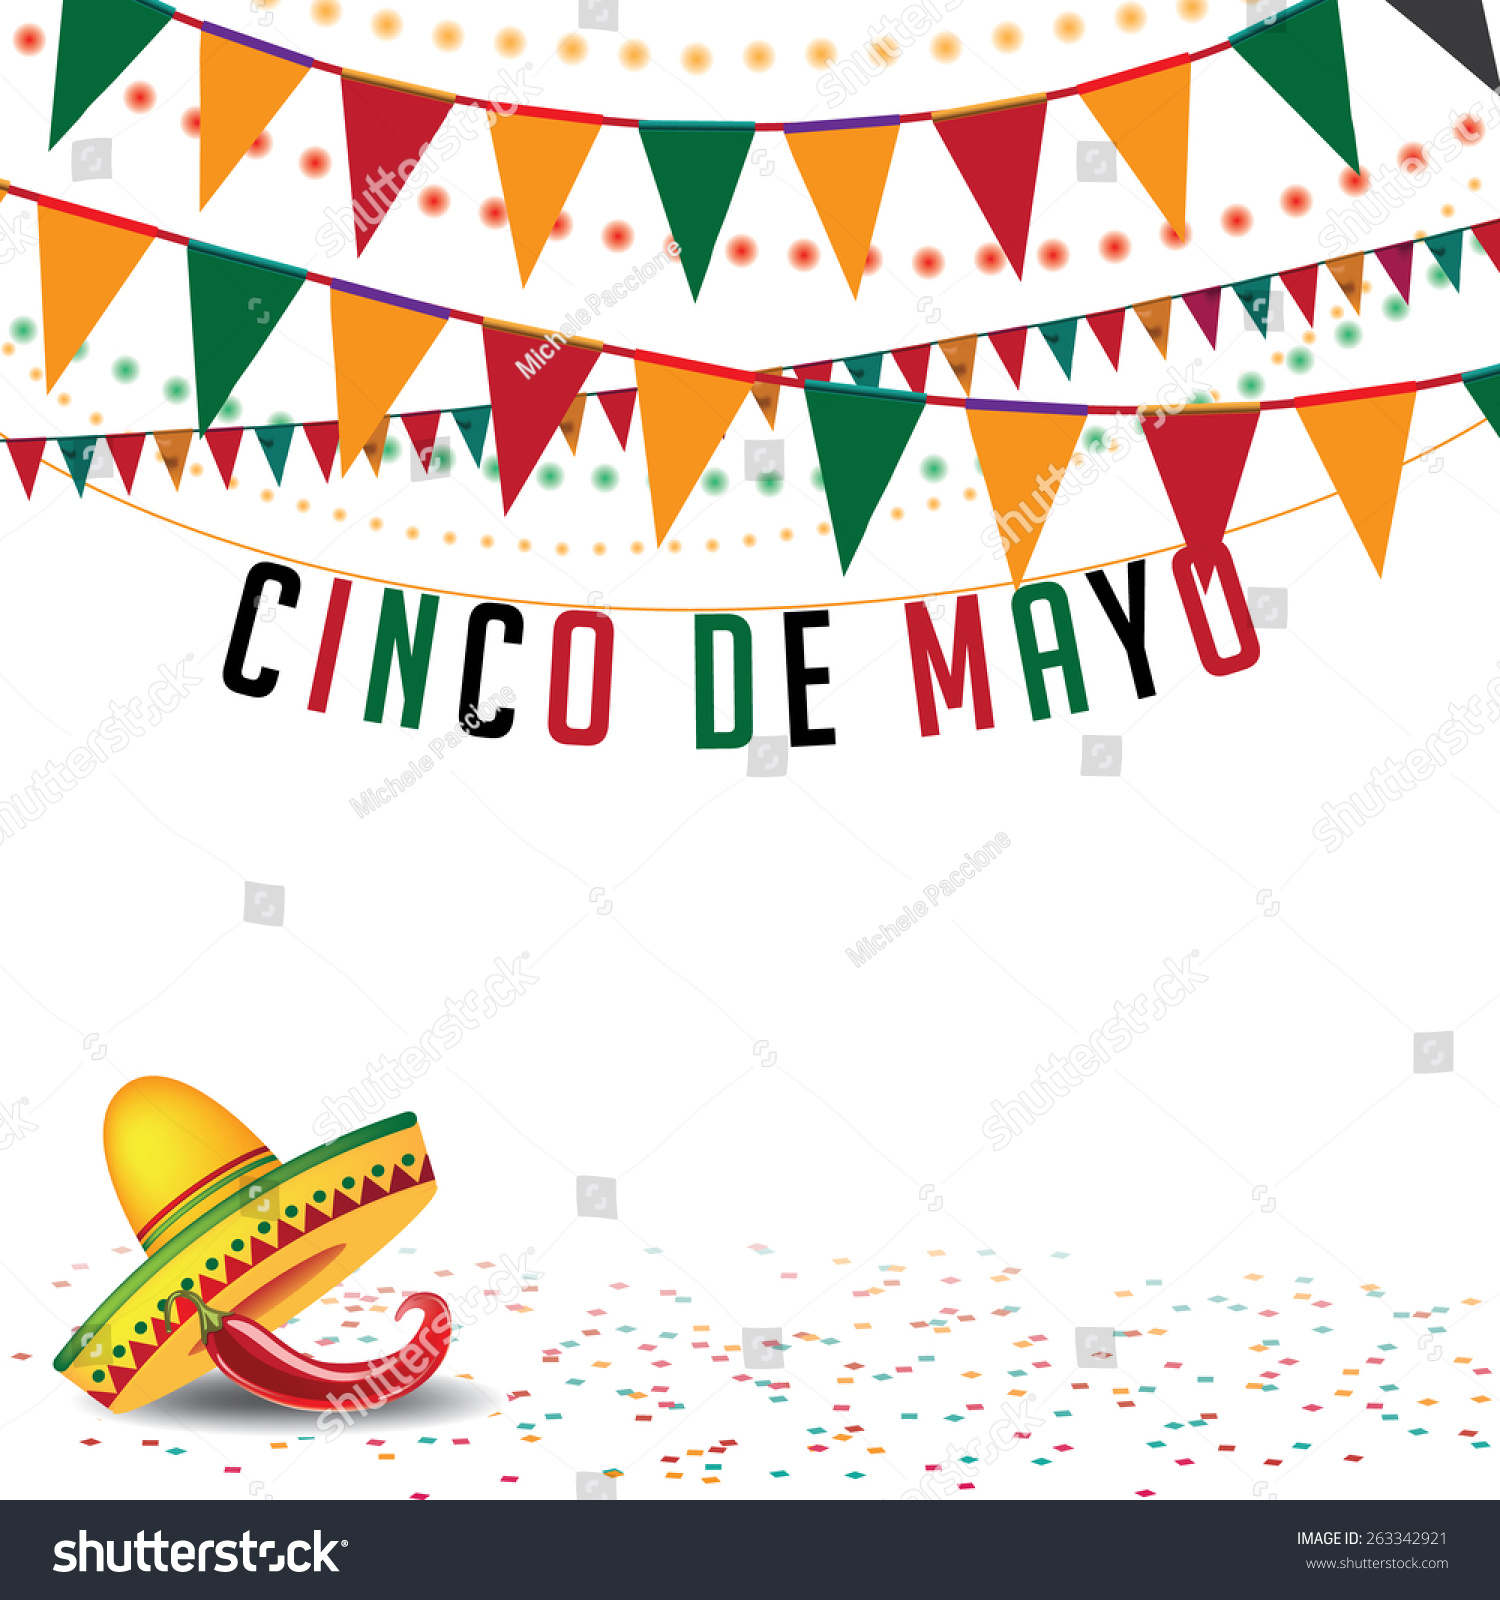 Cinco De Mayo Bunting Background Eps Stock Vector 263342921 ...